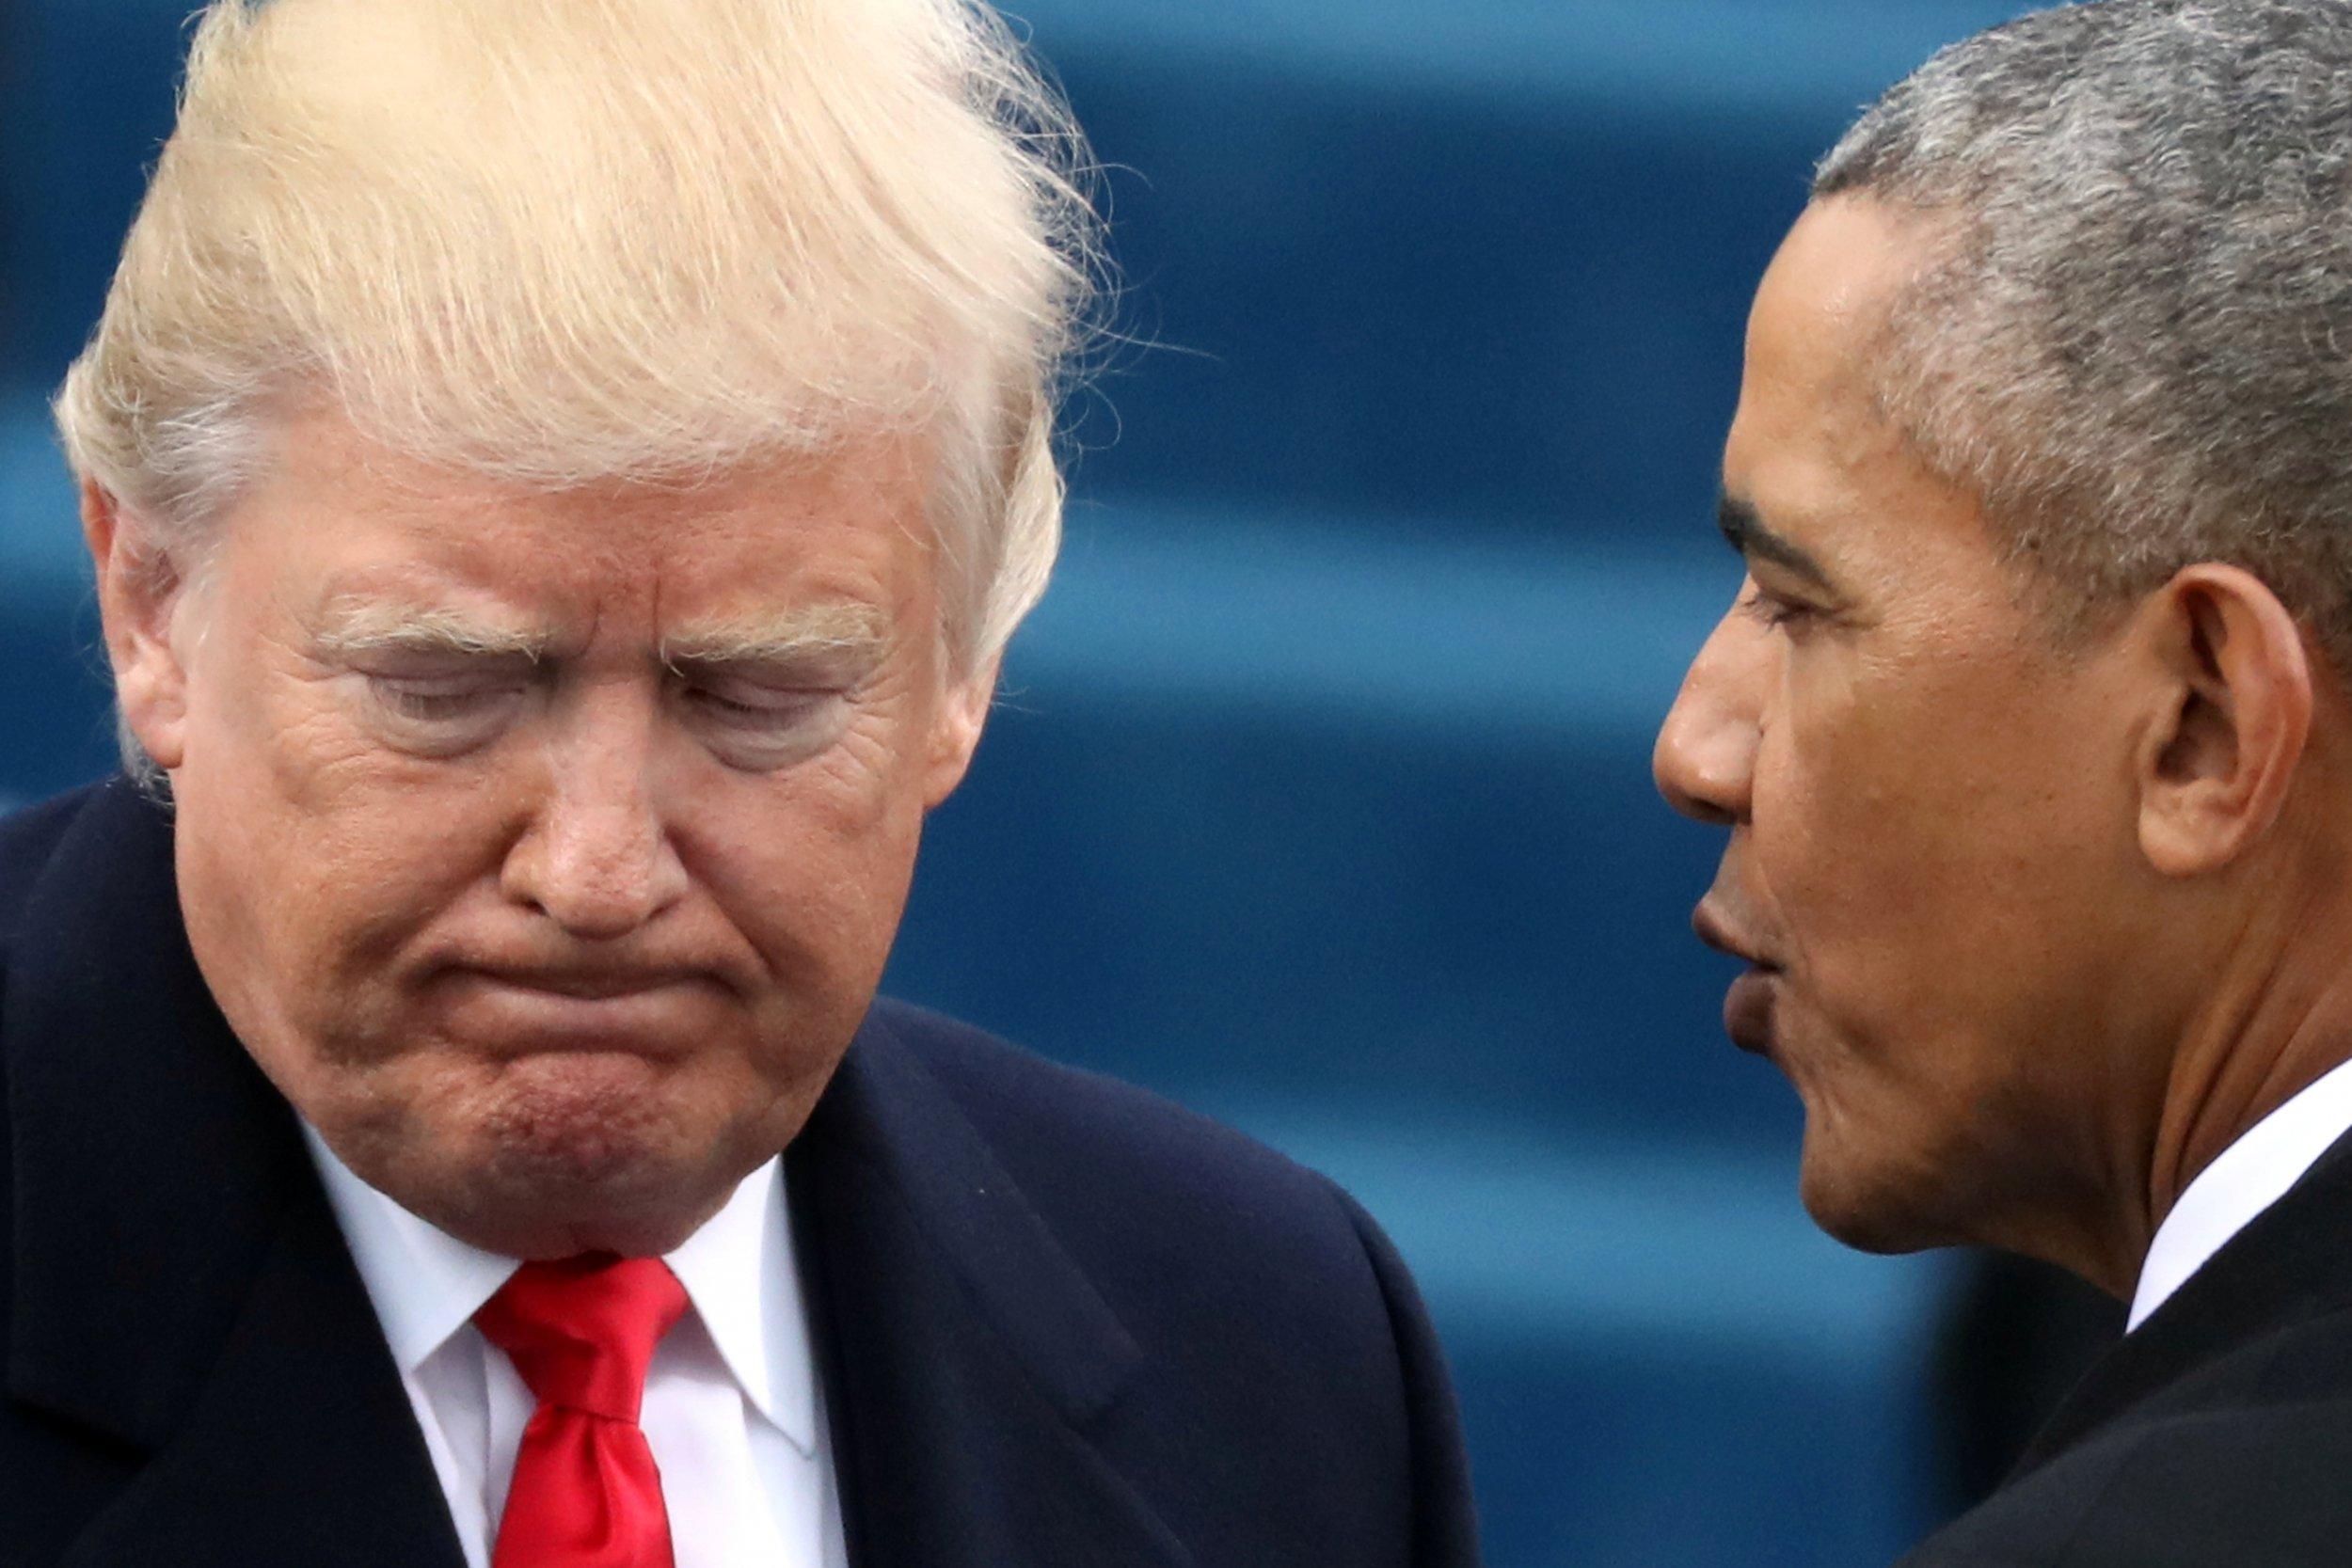 Obama Christmas.Donald Trump Set To Follow Barack Obama S Christmas